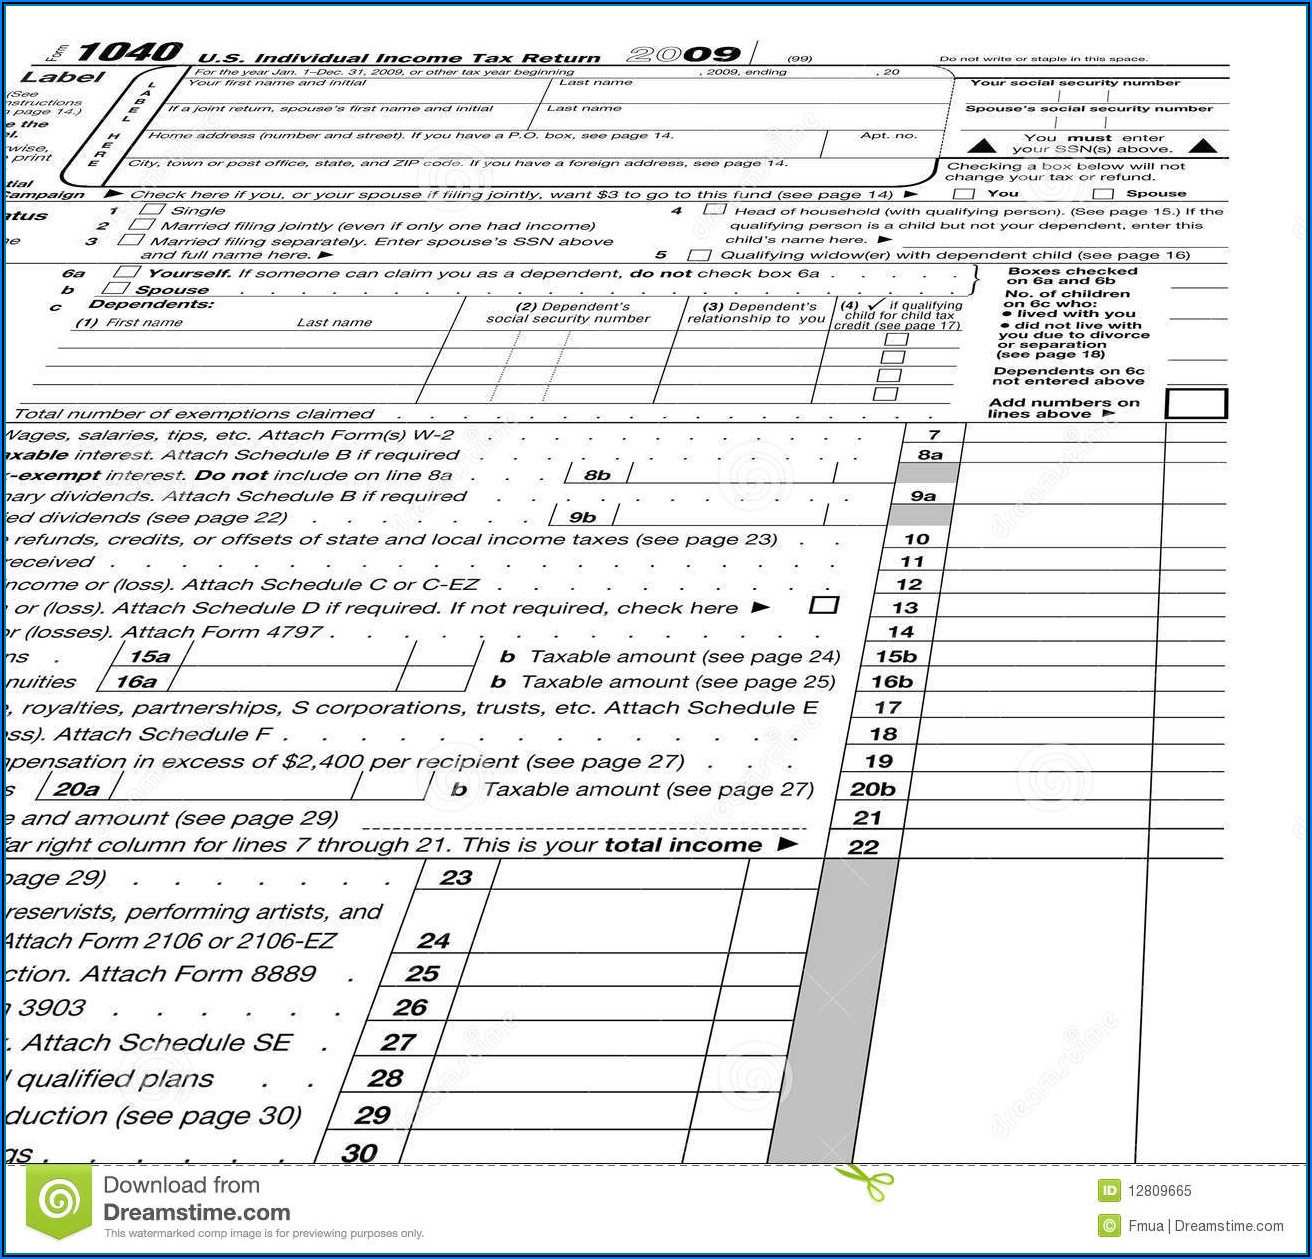 Irs Form 1040 Tax Year 2011